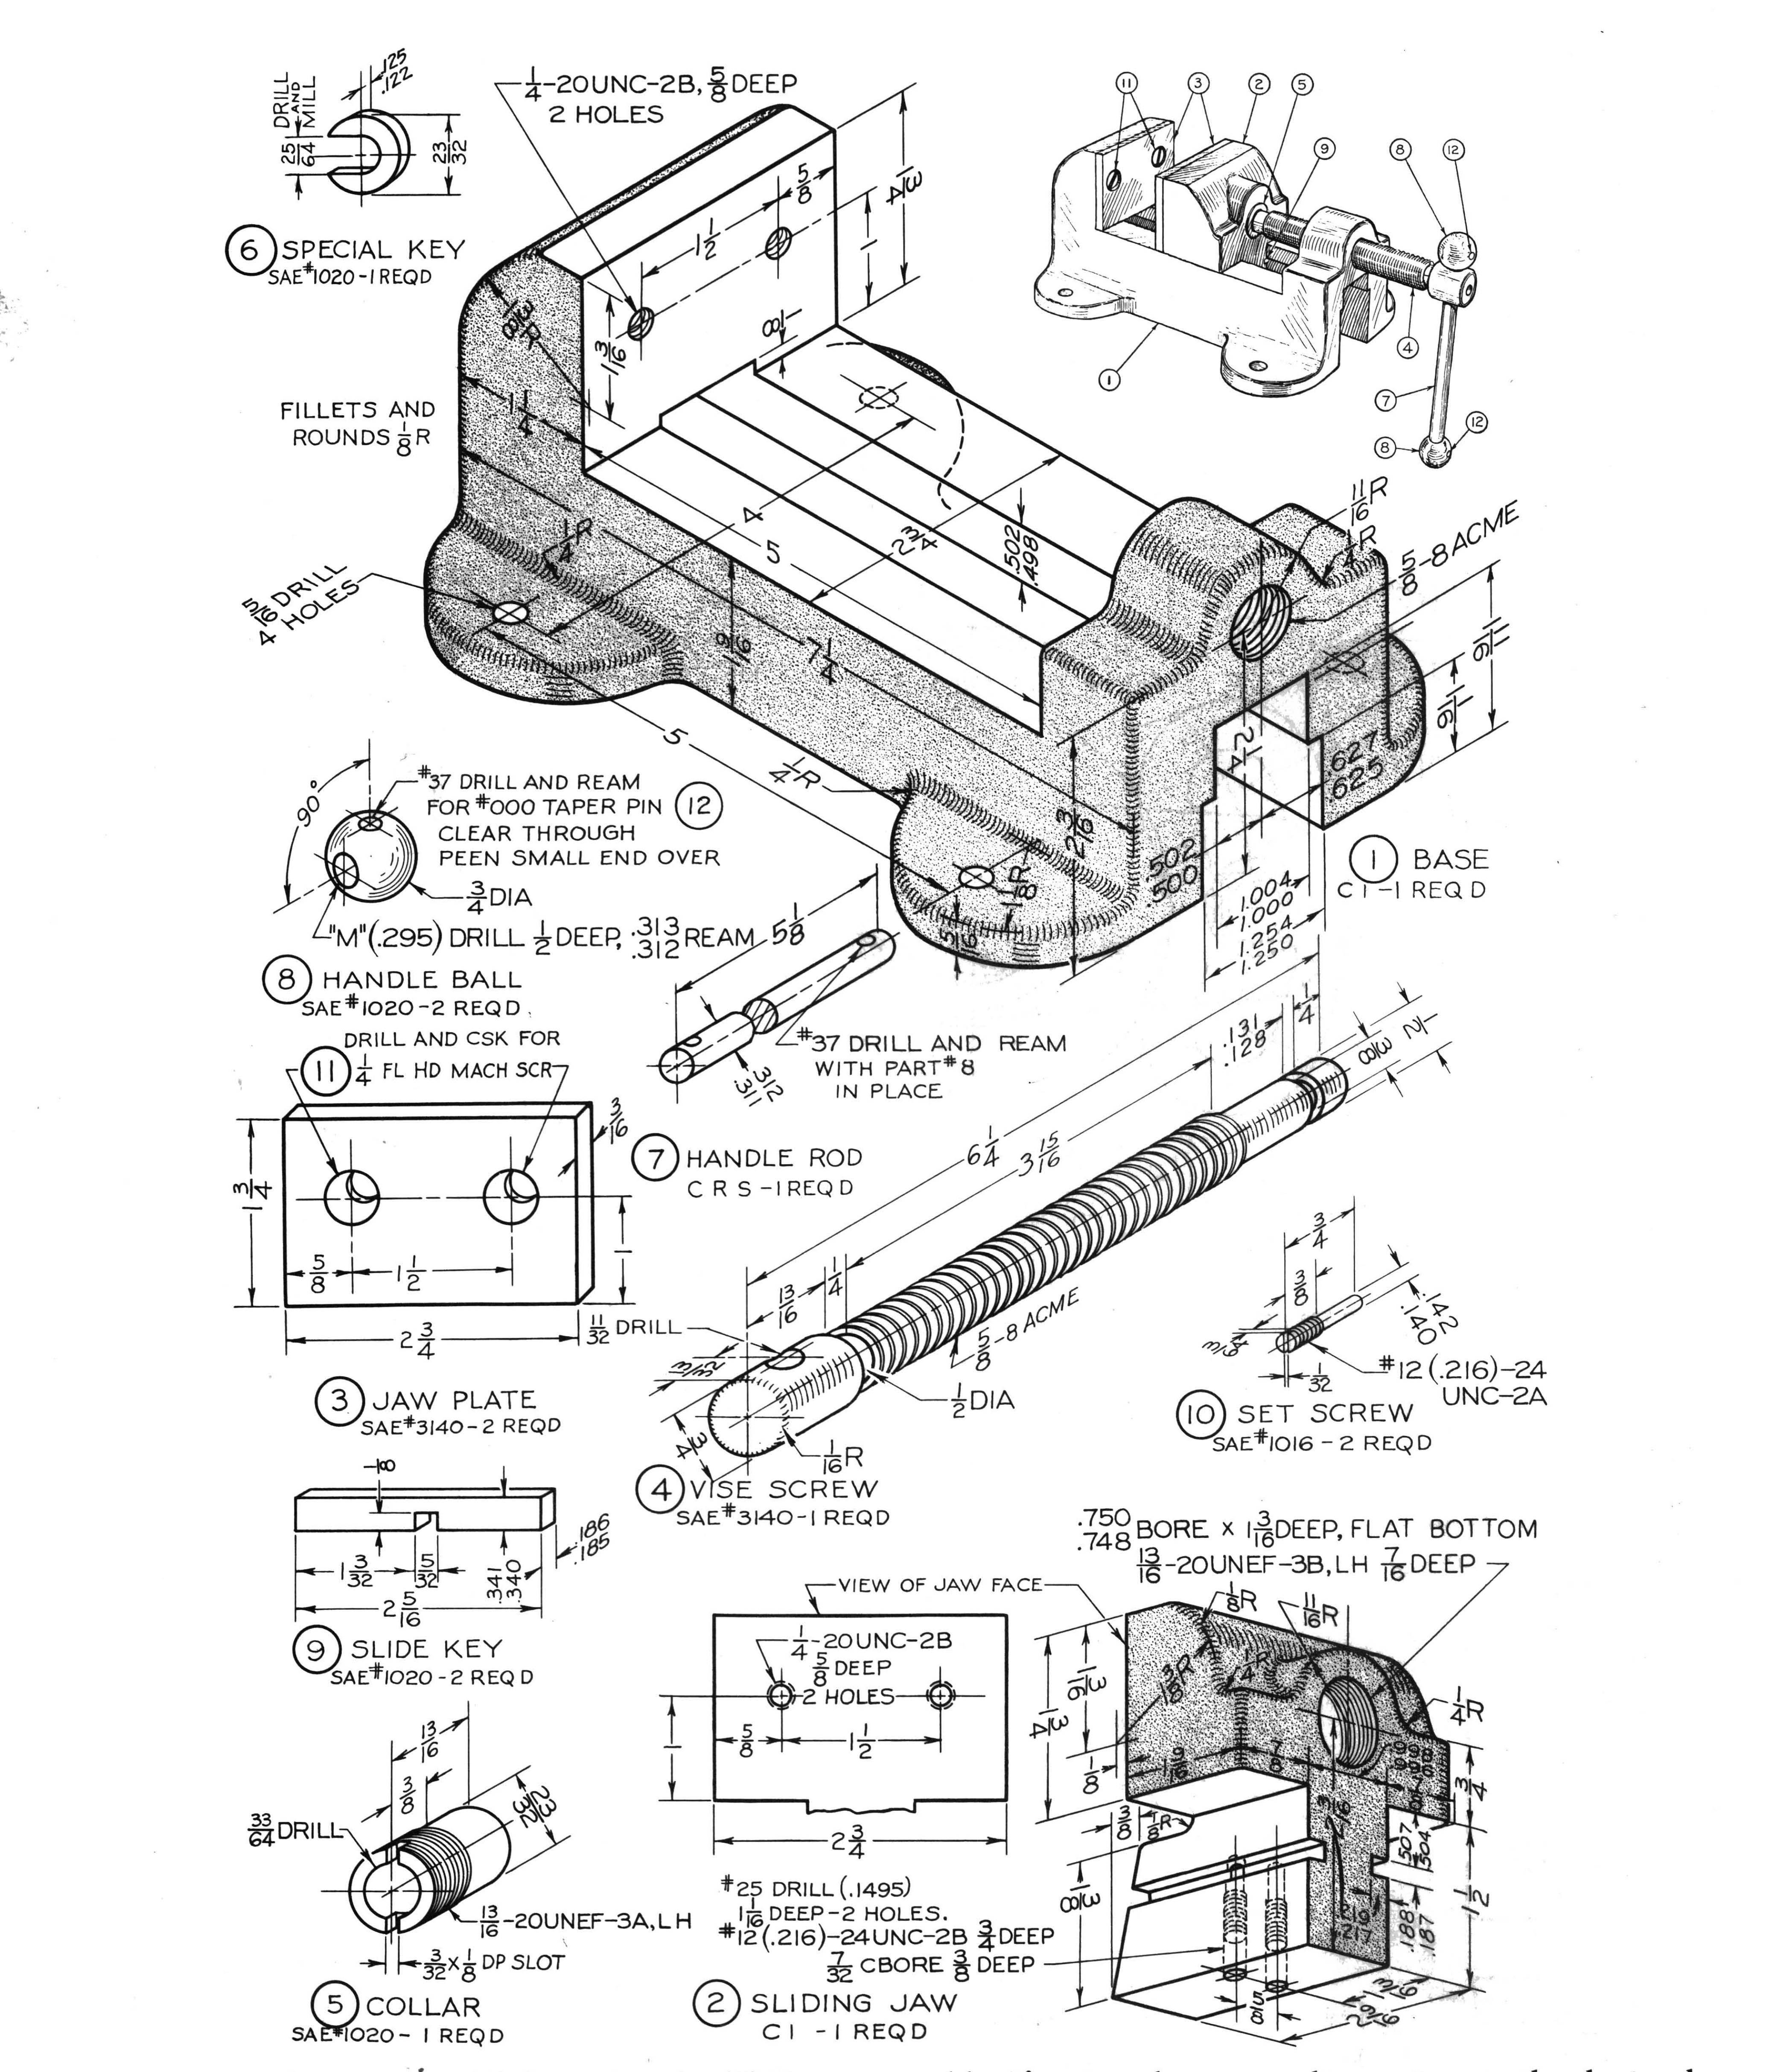 hight resolution of solidworks tutorial 3d cad models engineering works mechanical engineering mechanical design